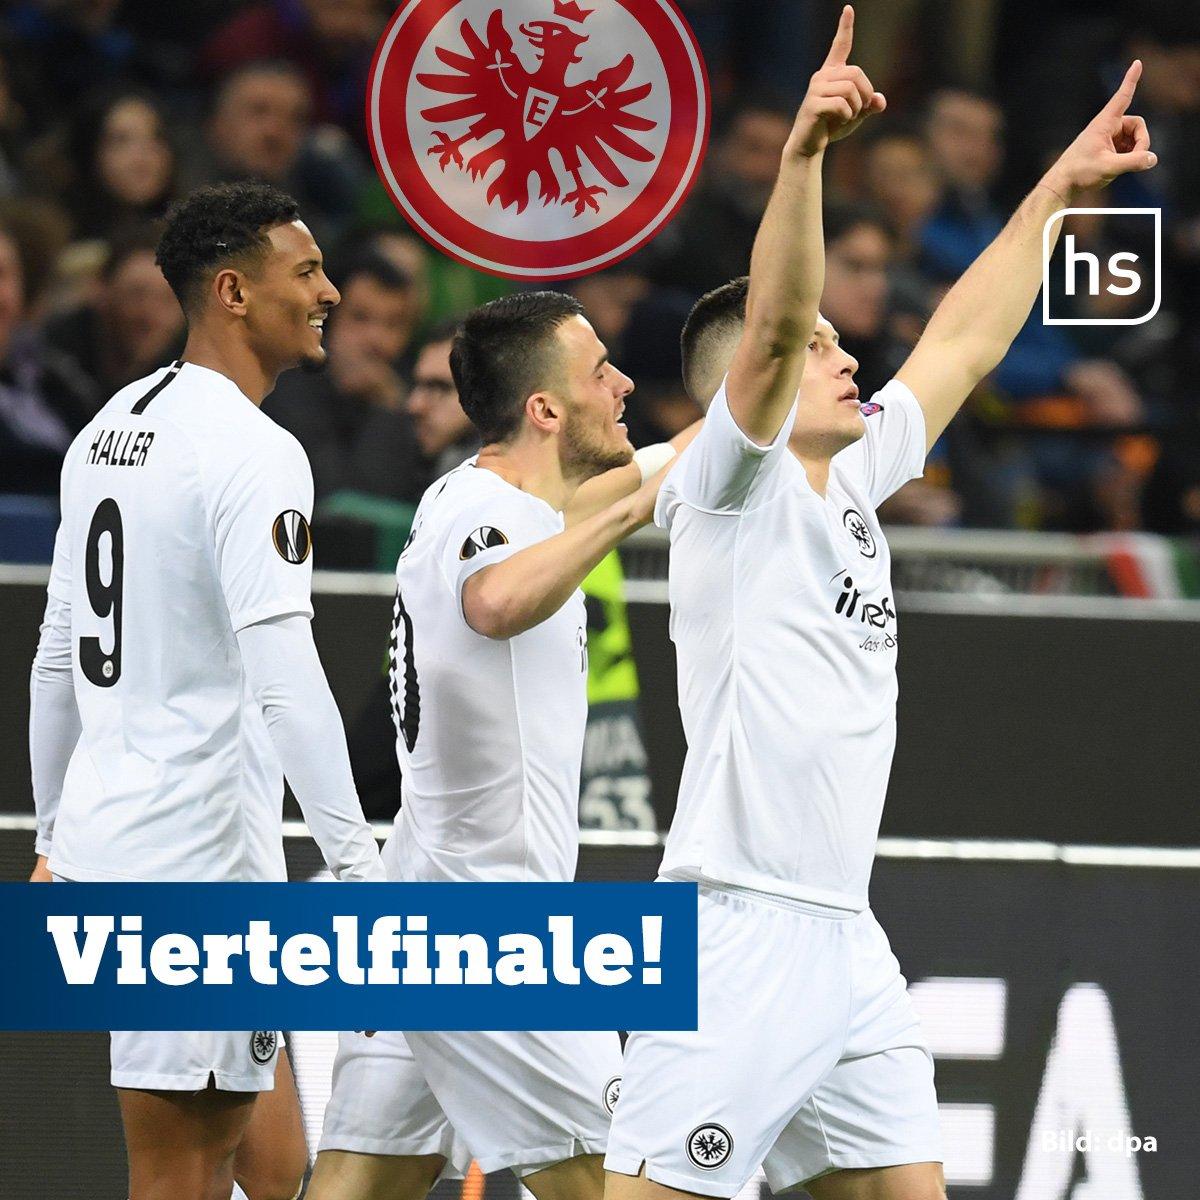 hessenschau's photo on #Eintracht